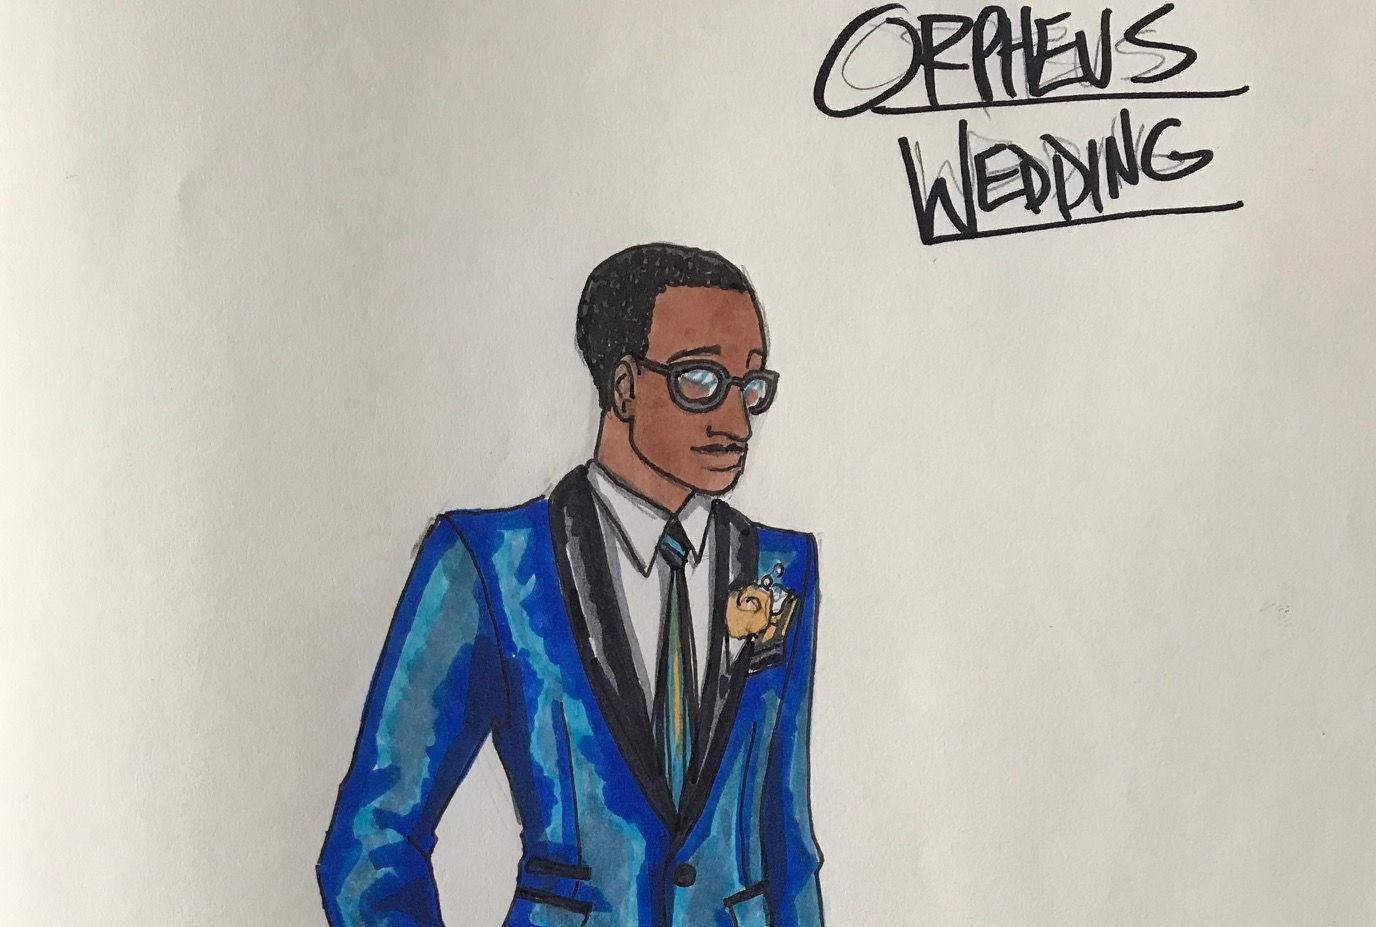 Orpheus Wedding